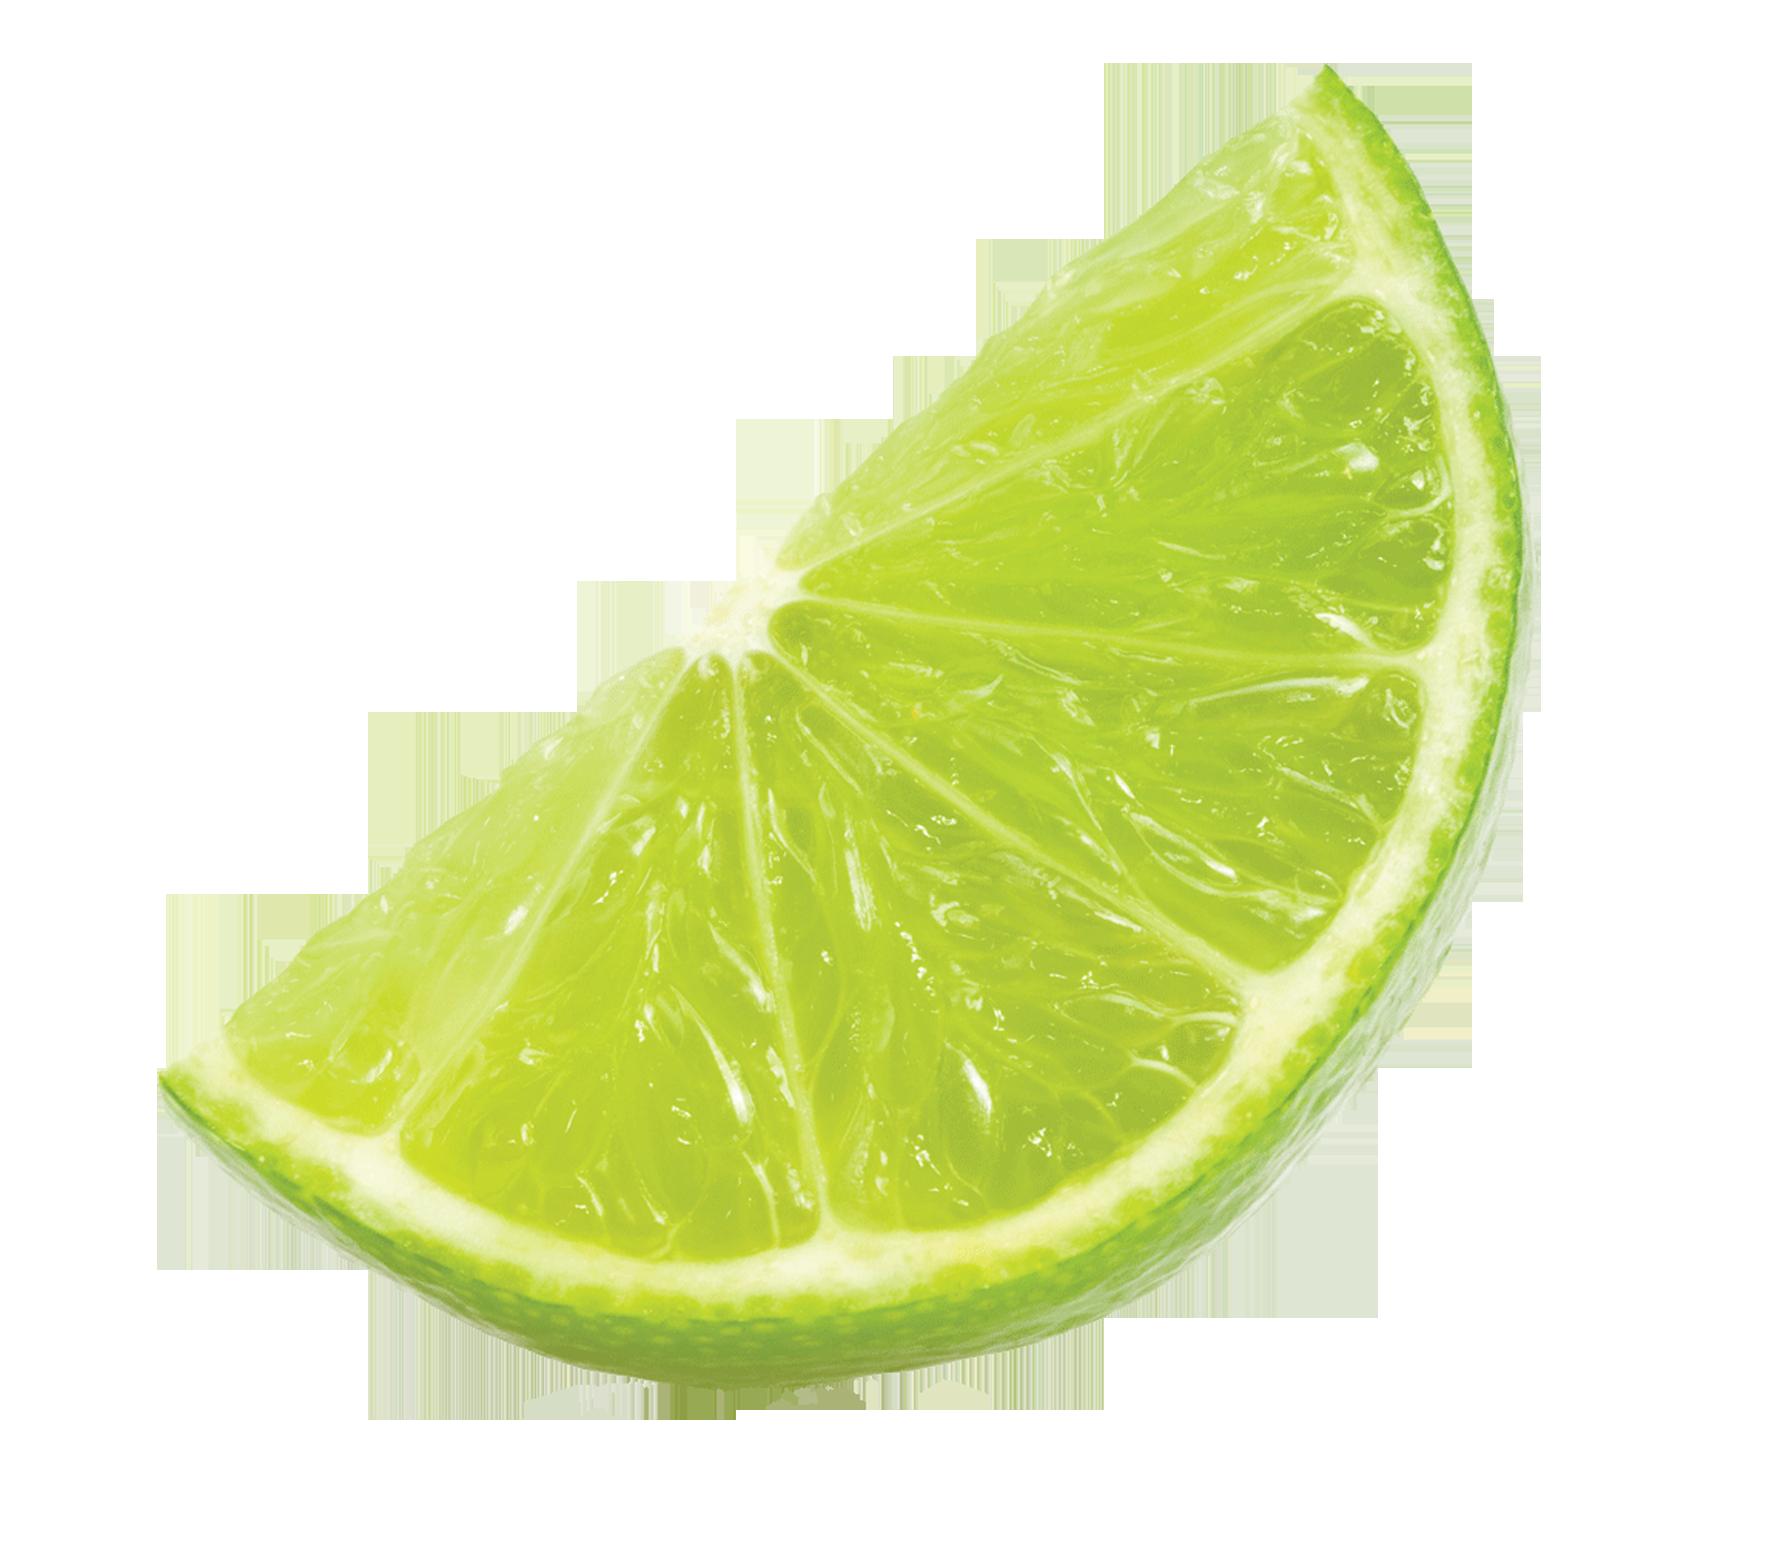 Pin By Mariya On Design Lemon Clipart Clip Art Lime